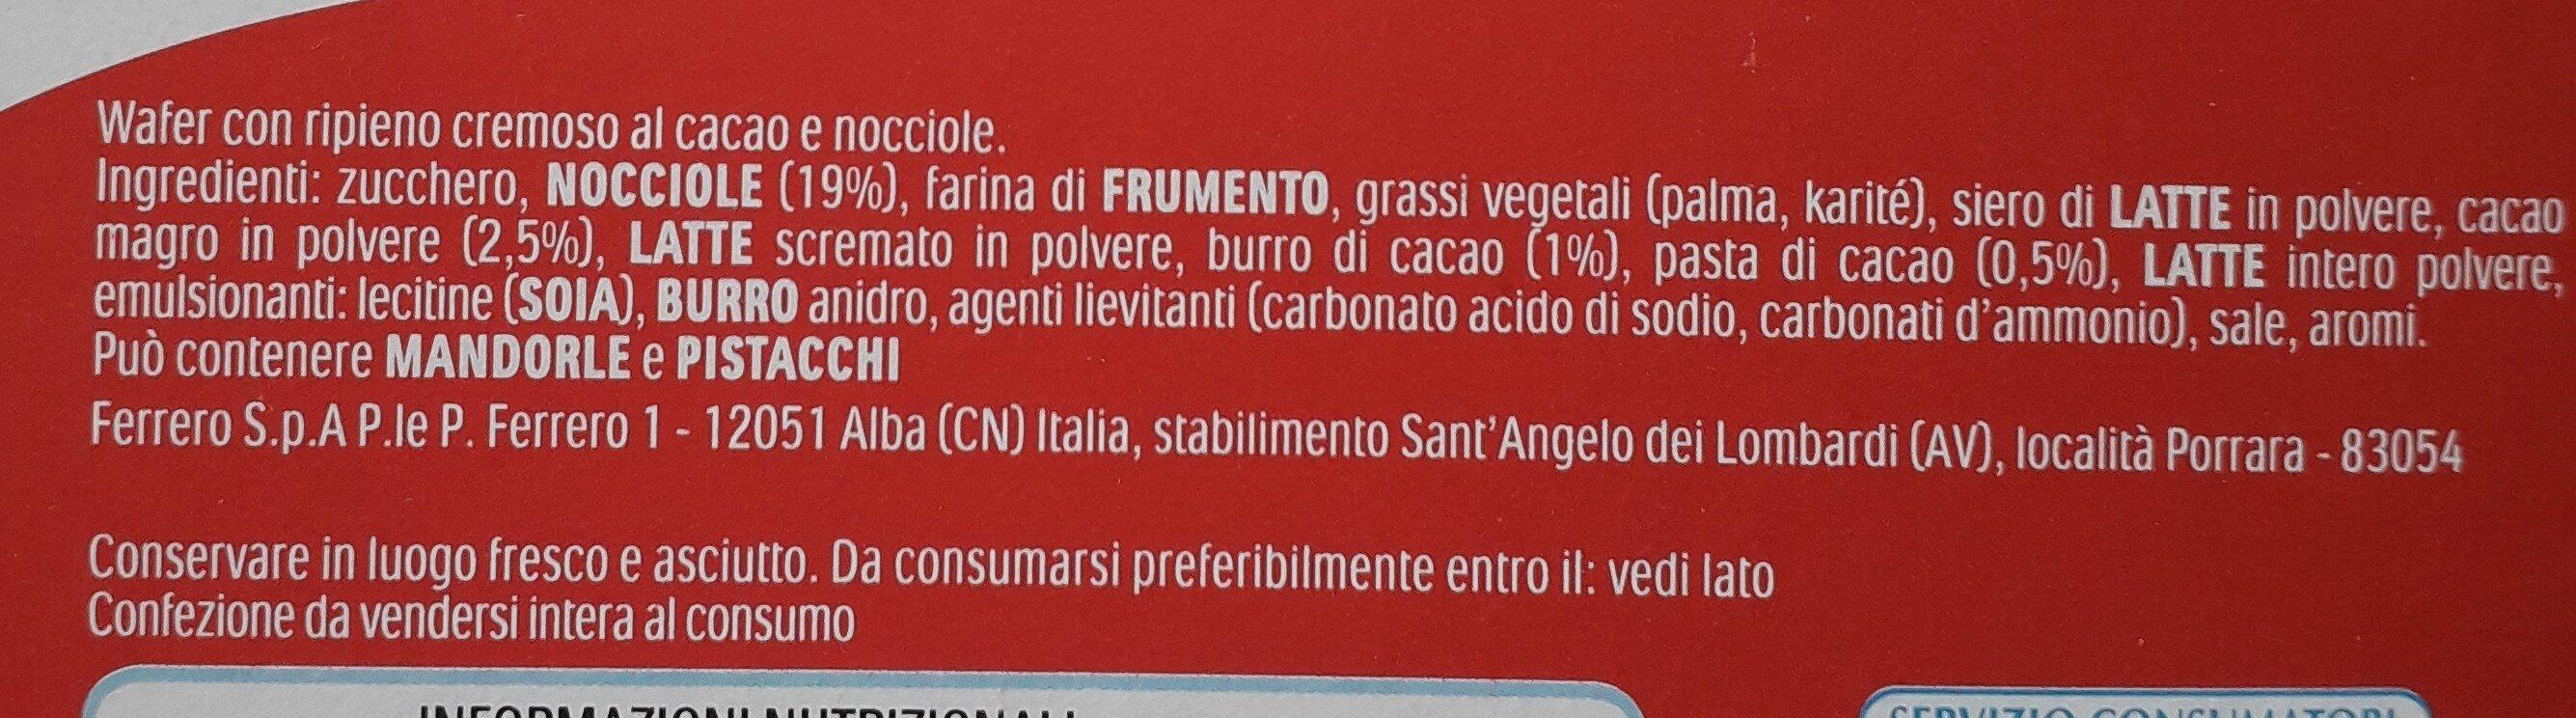 Tronky Nocciola Singolo - Producte - it